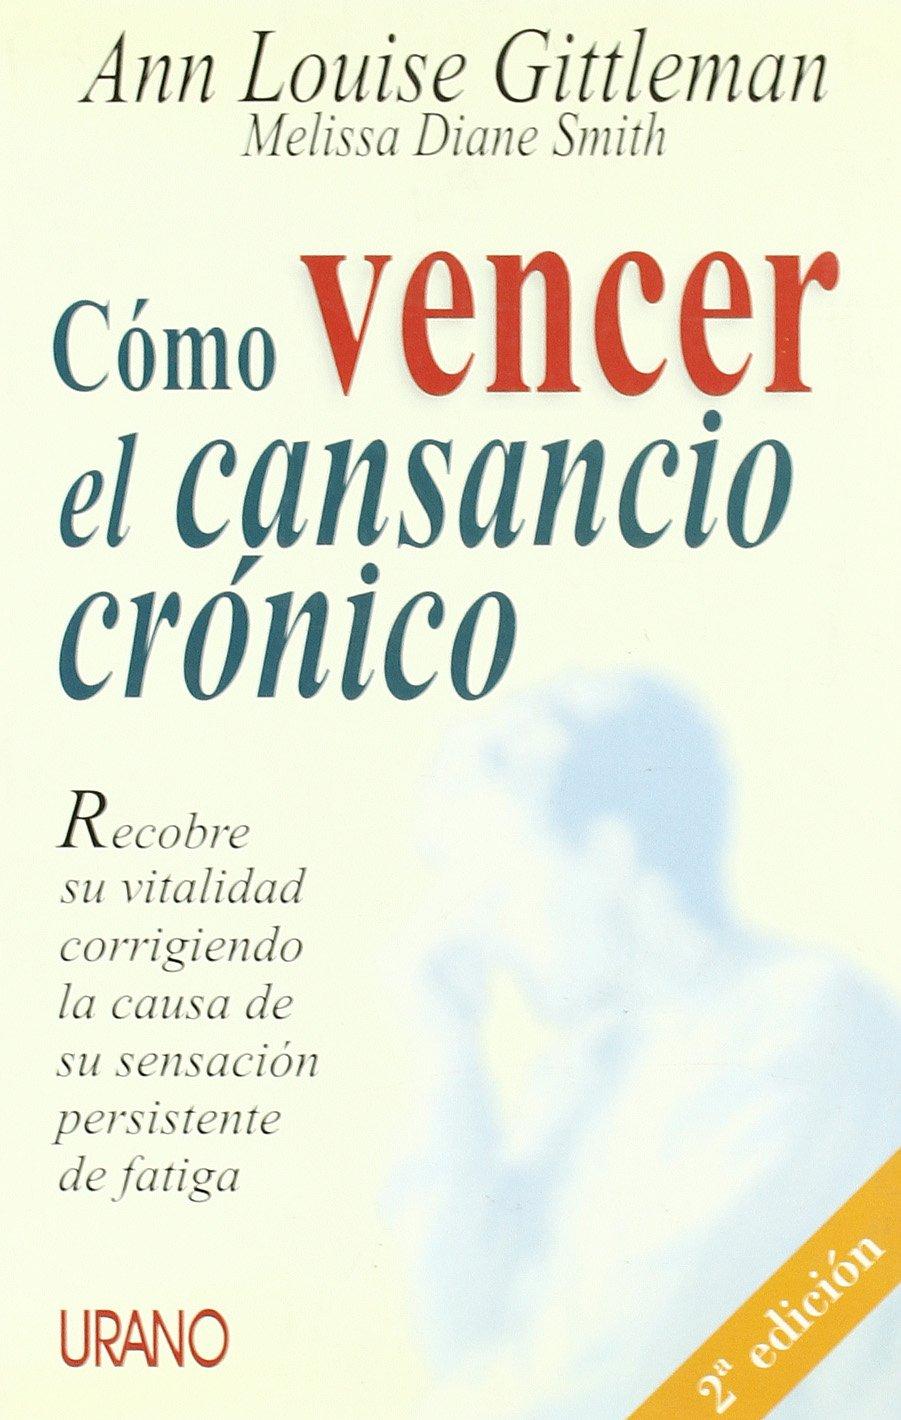 Como Vencer El Cansancio Cronico (Spanish Edition): Ann Louise Gittleman, Melissa Diane Smith: 9788479533755: Amazon.com: Books